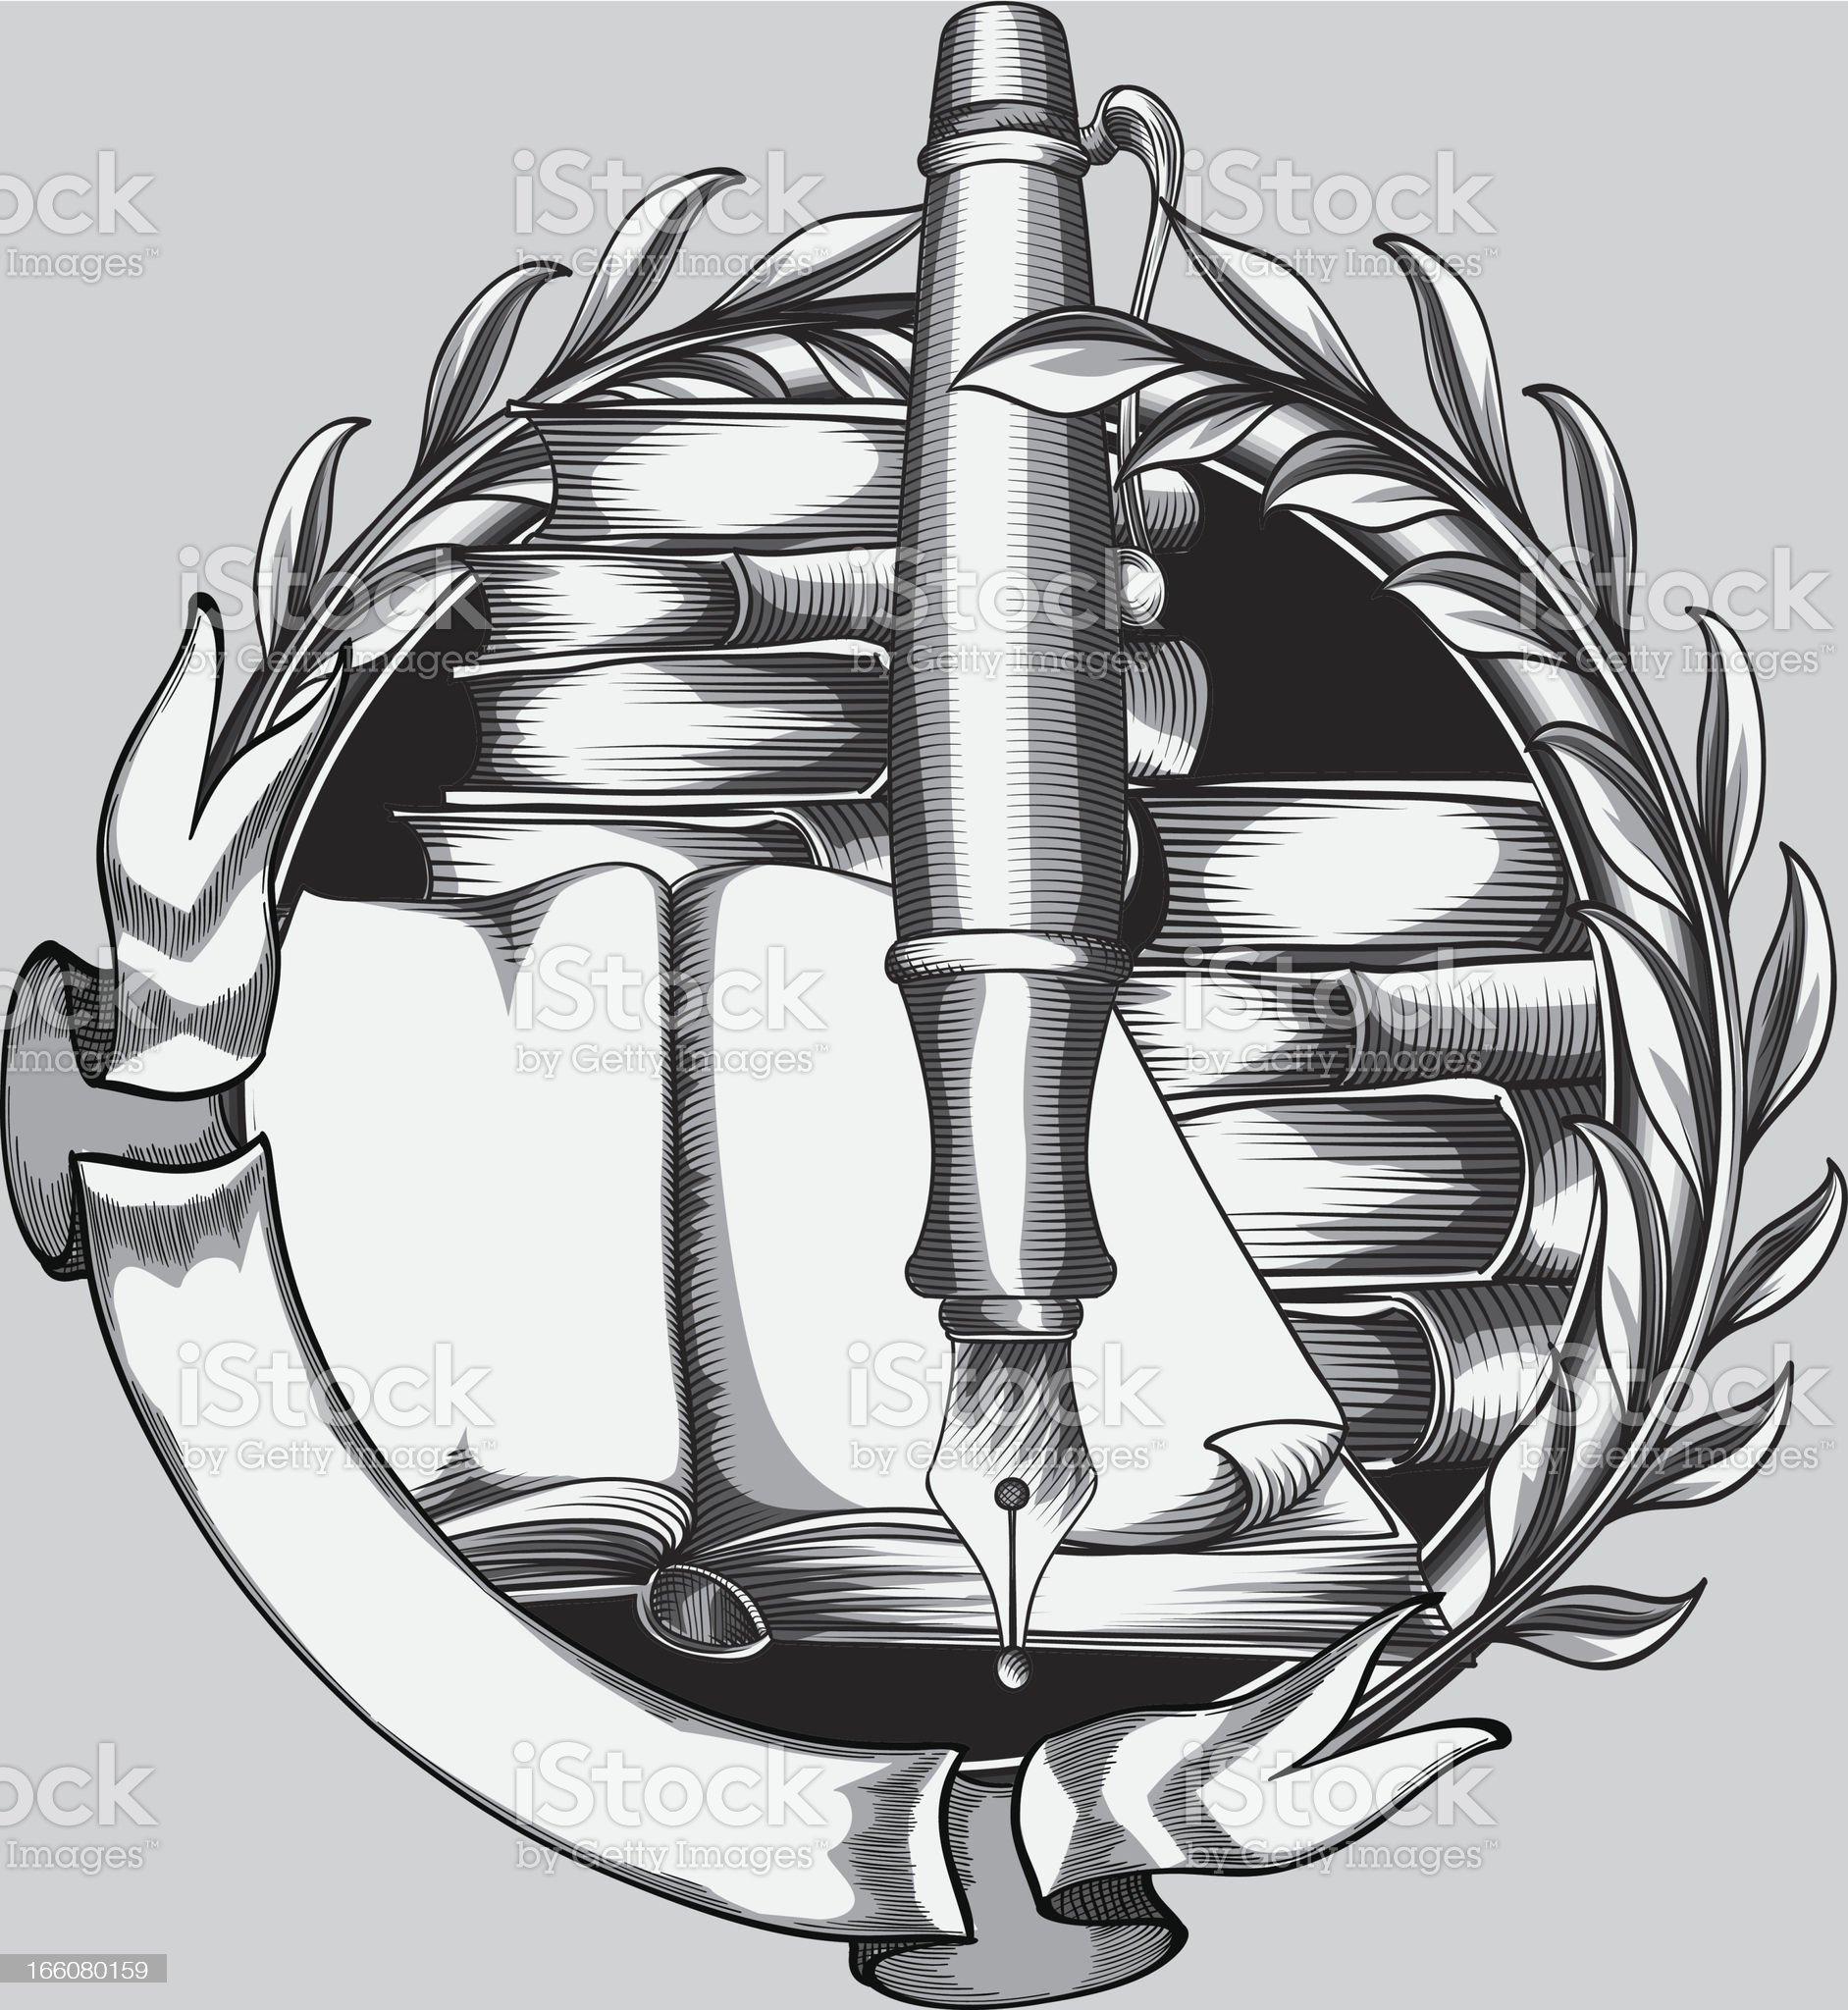 Pen & books emblem royalty-free stock vector art